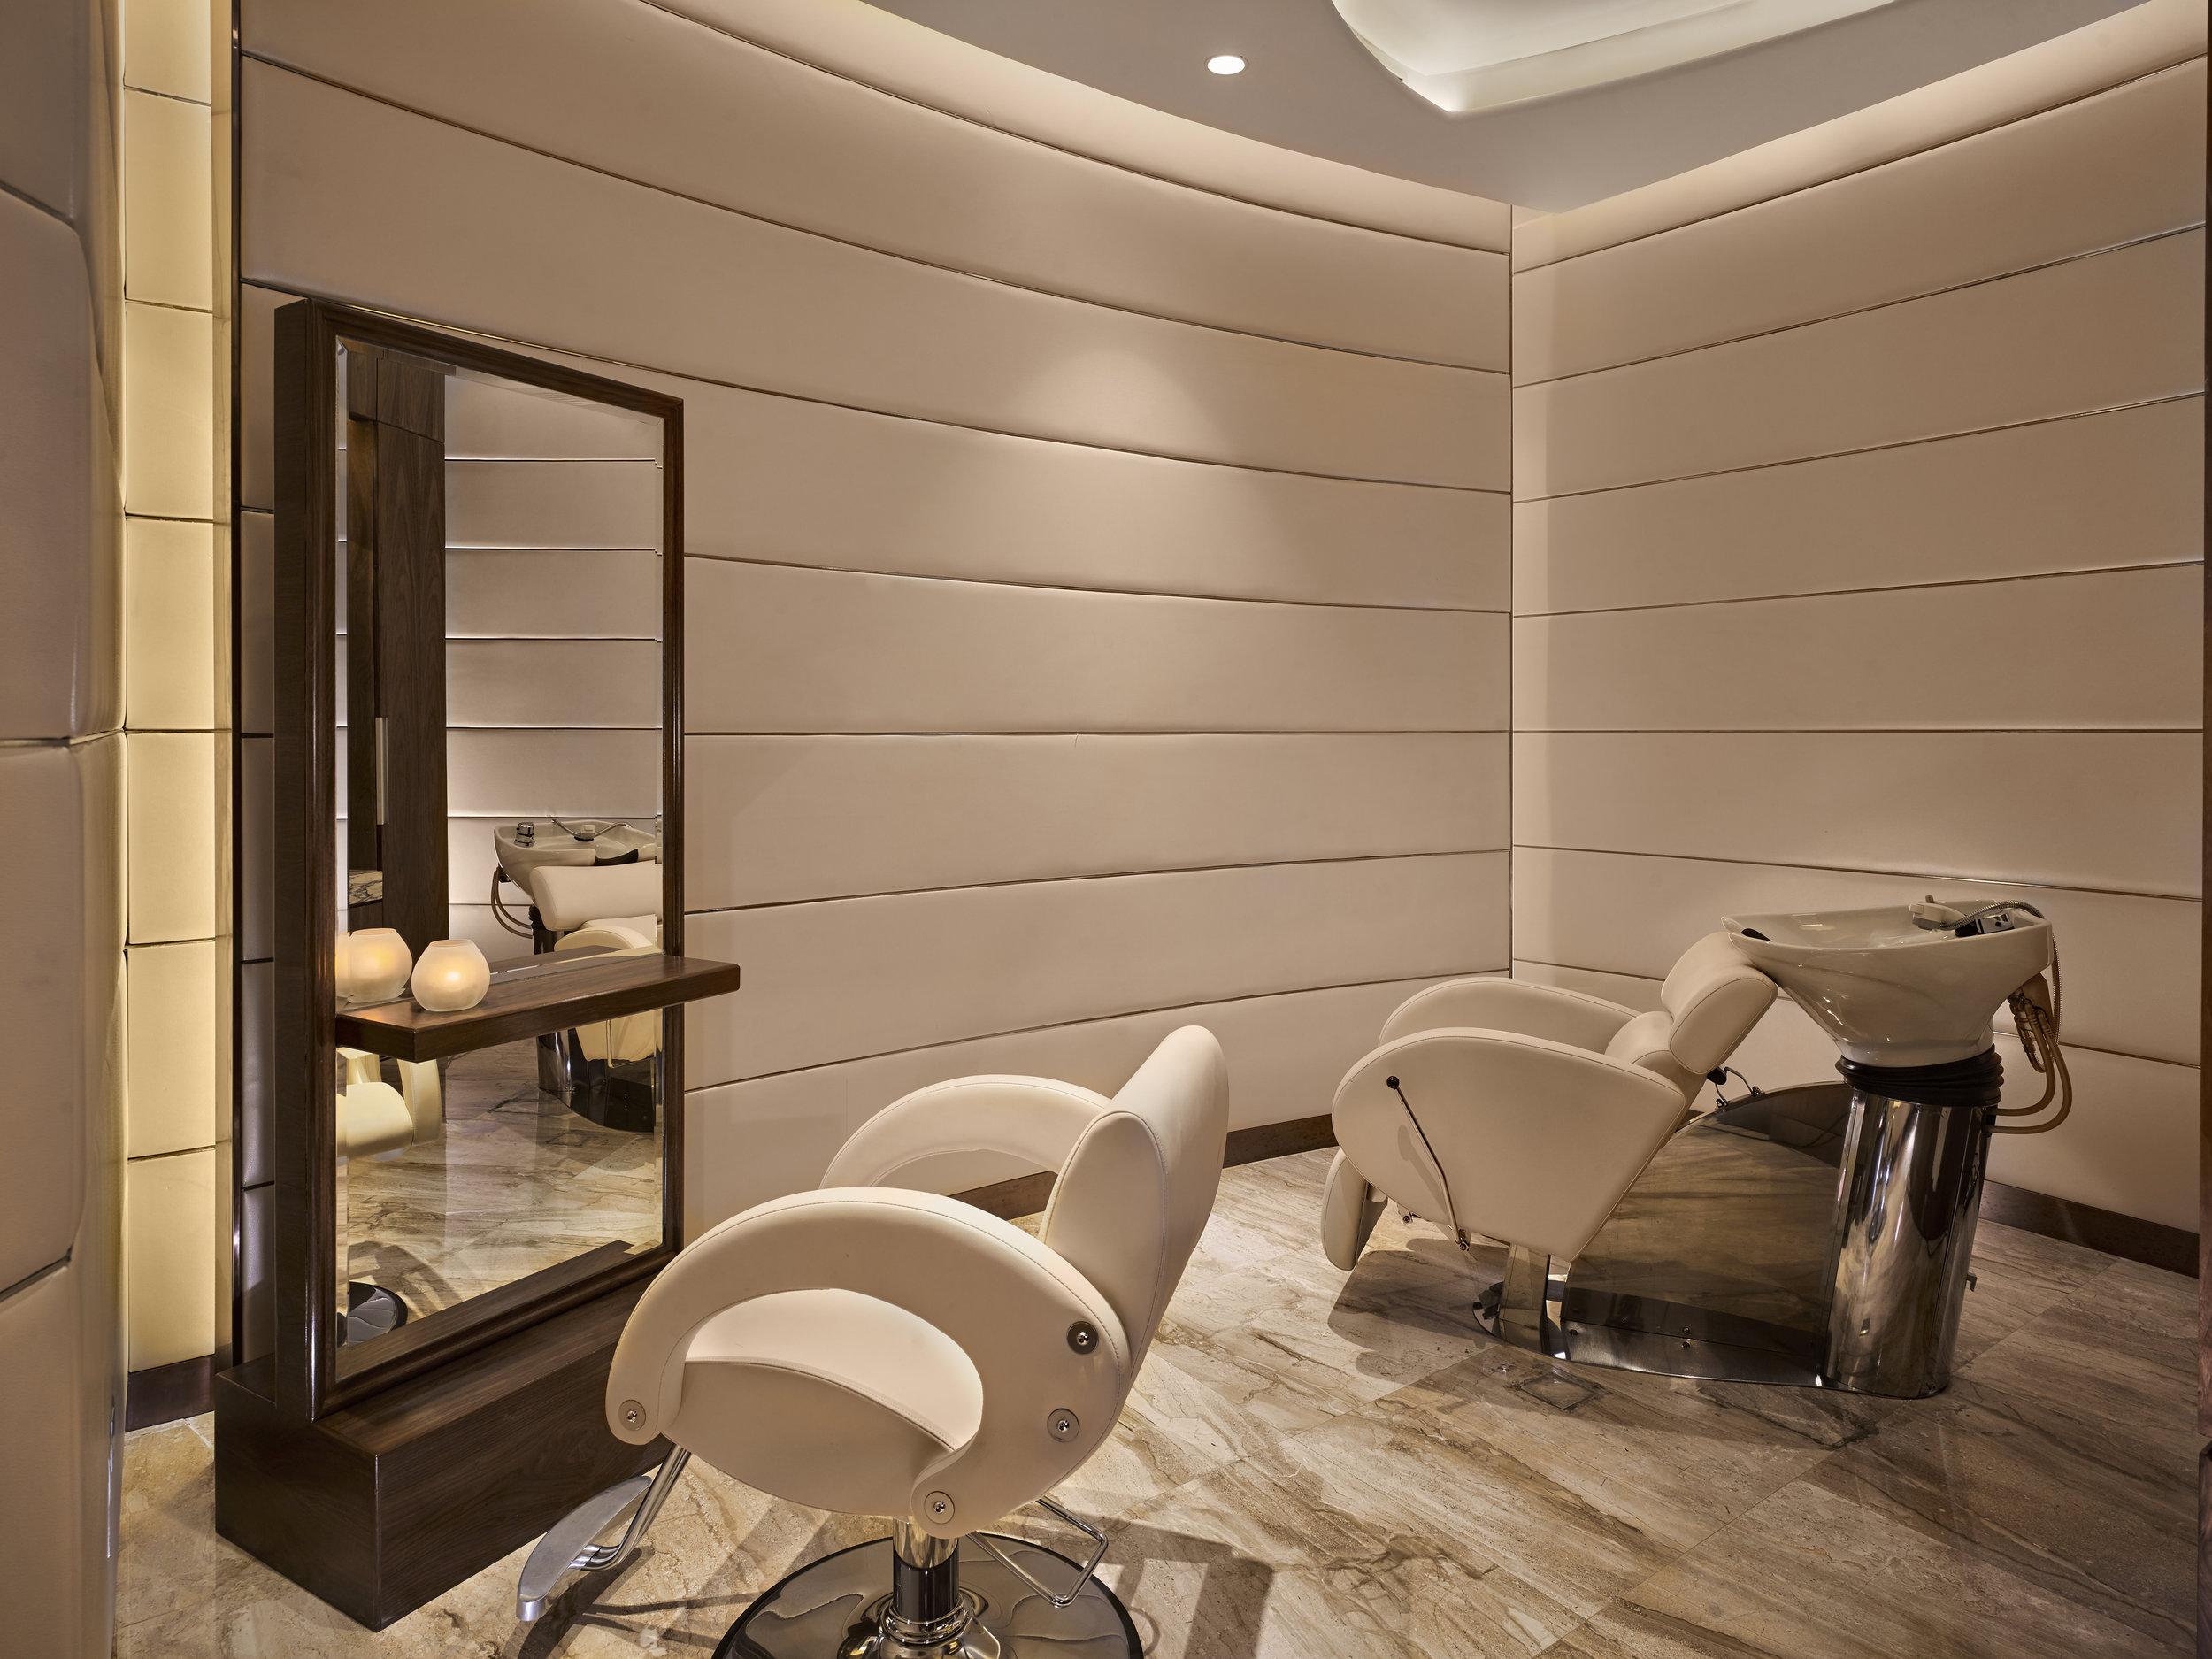 The Reverie Saigon - The Spa - Private Hair Salon Suite.jpg